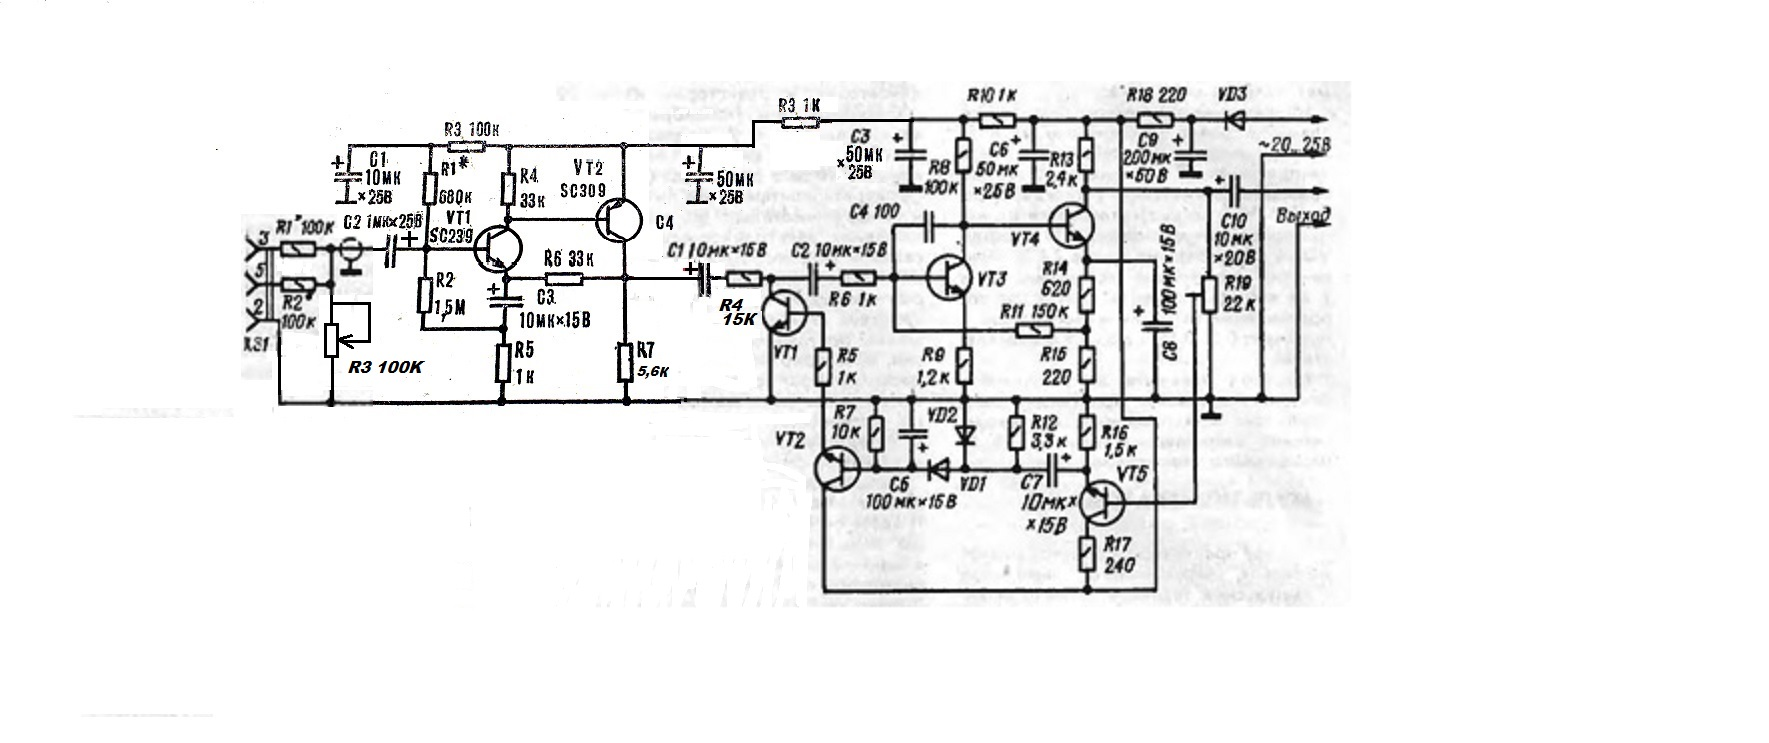 компрессор для цму схема